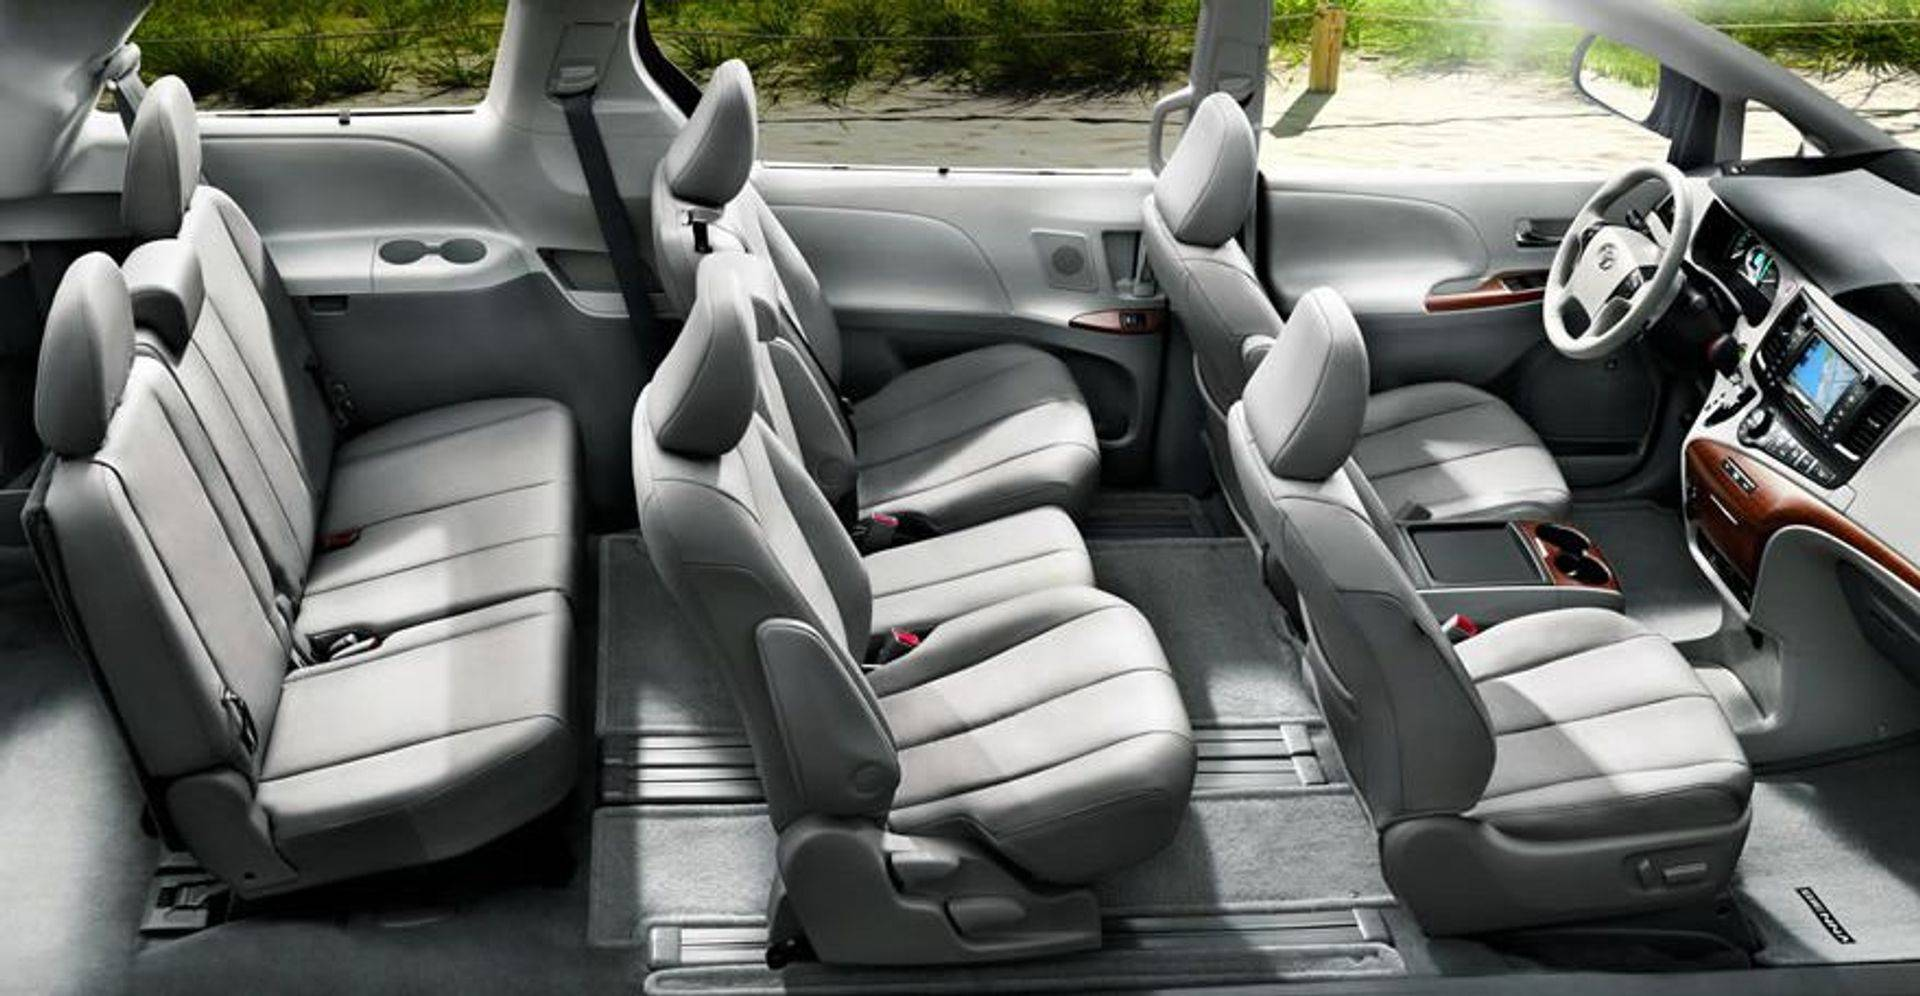 Toyota Sienna 2013 Inside